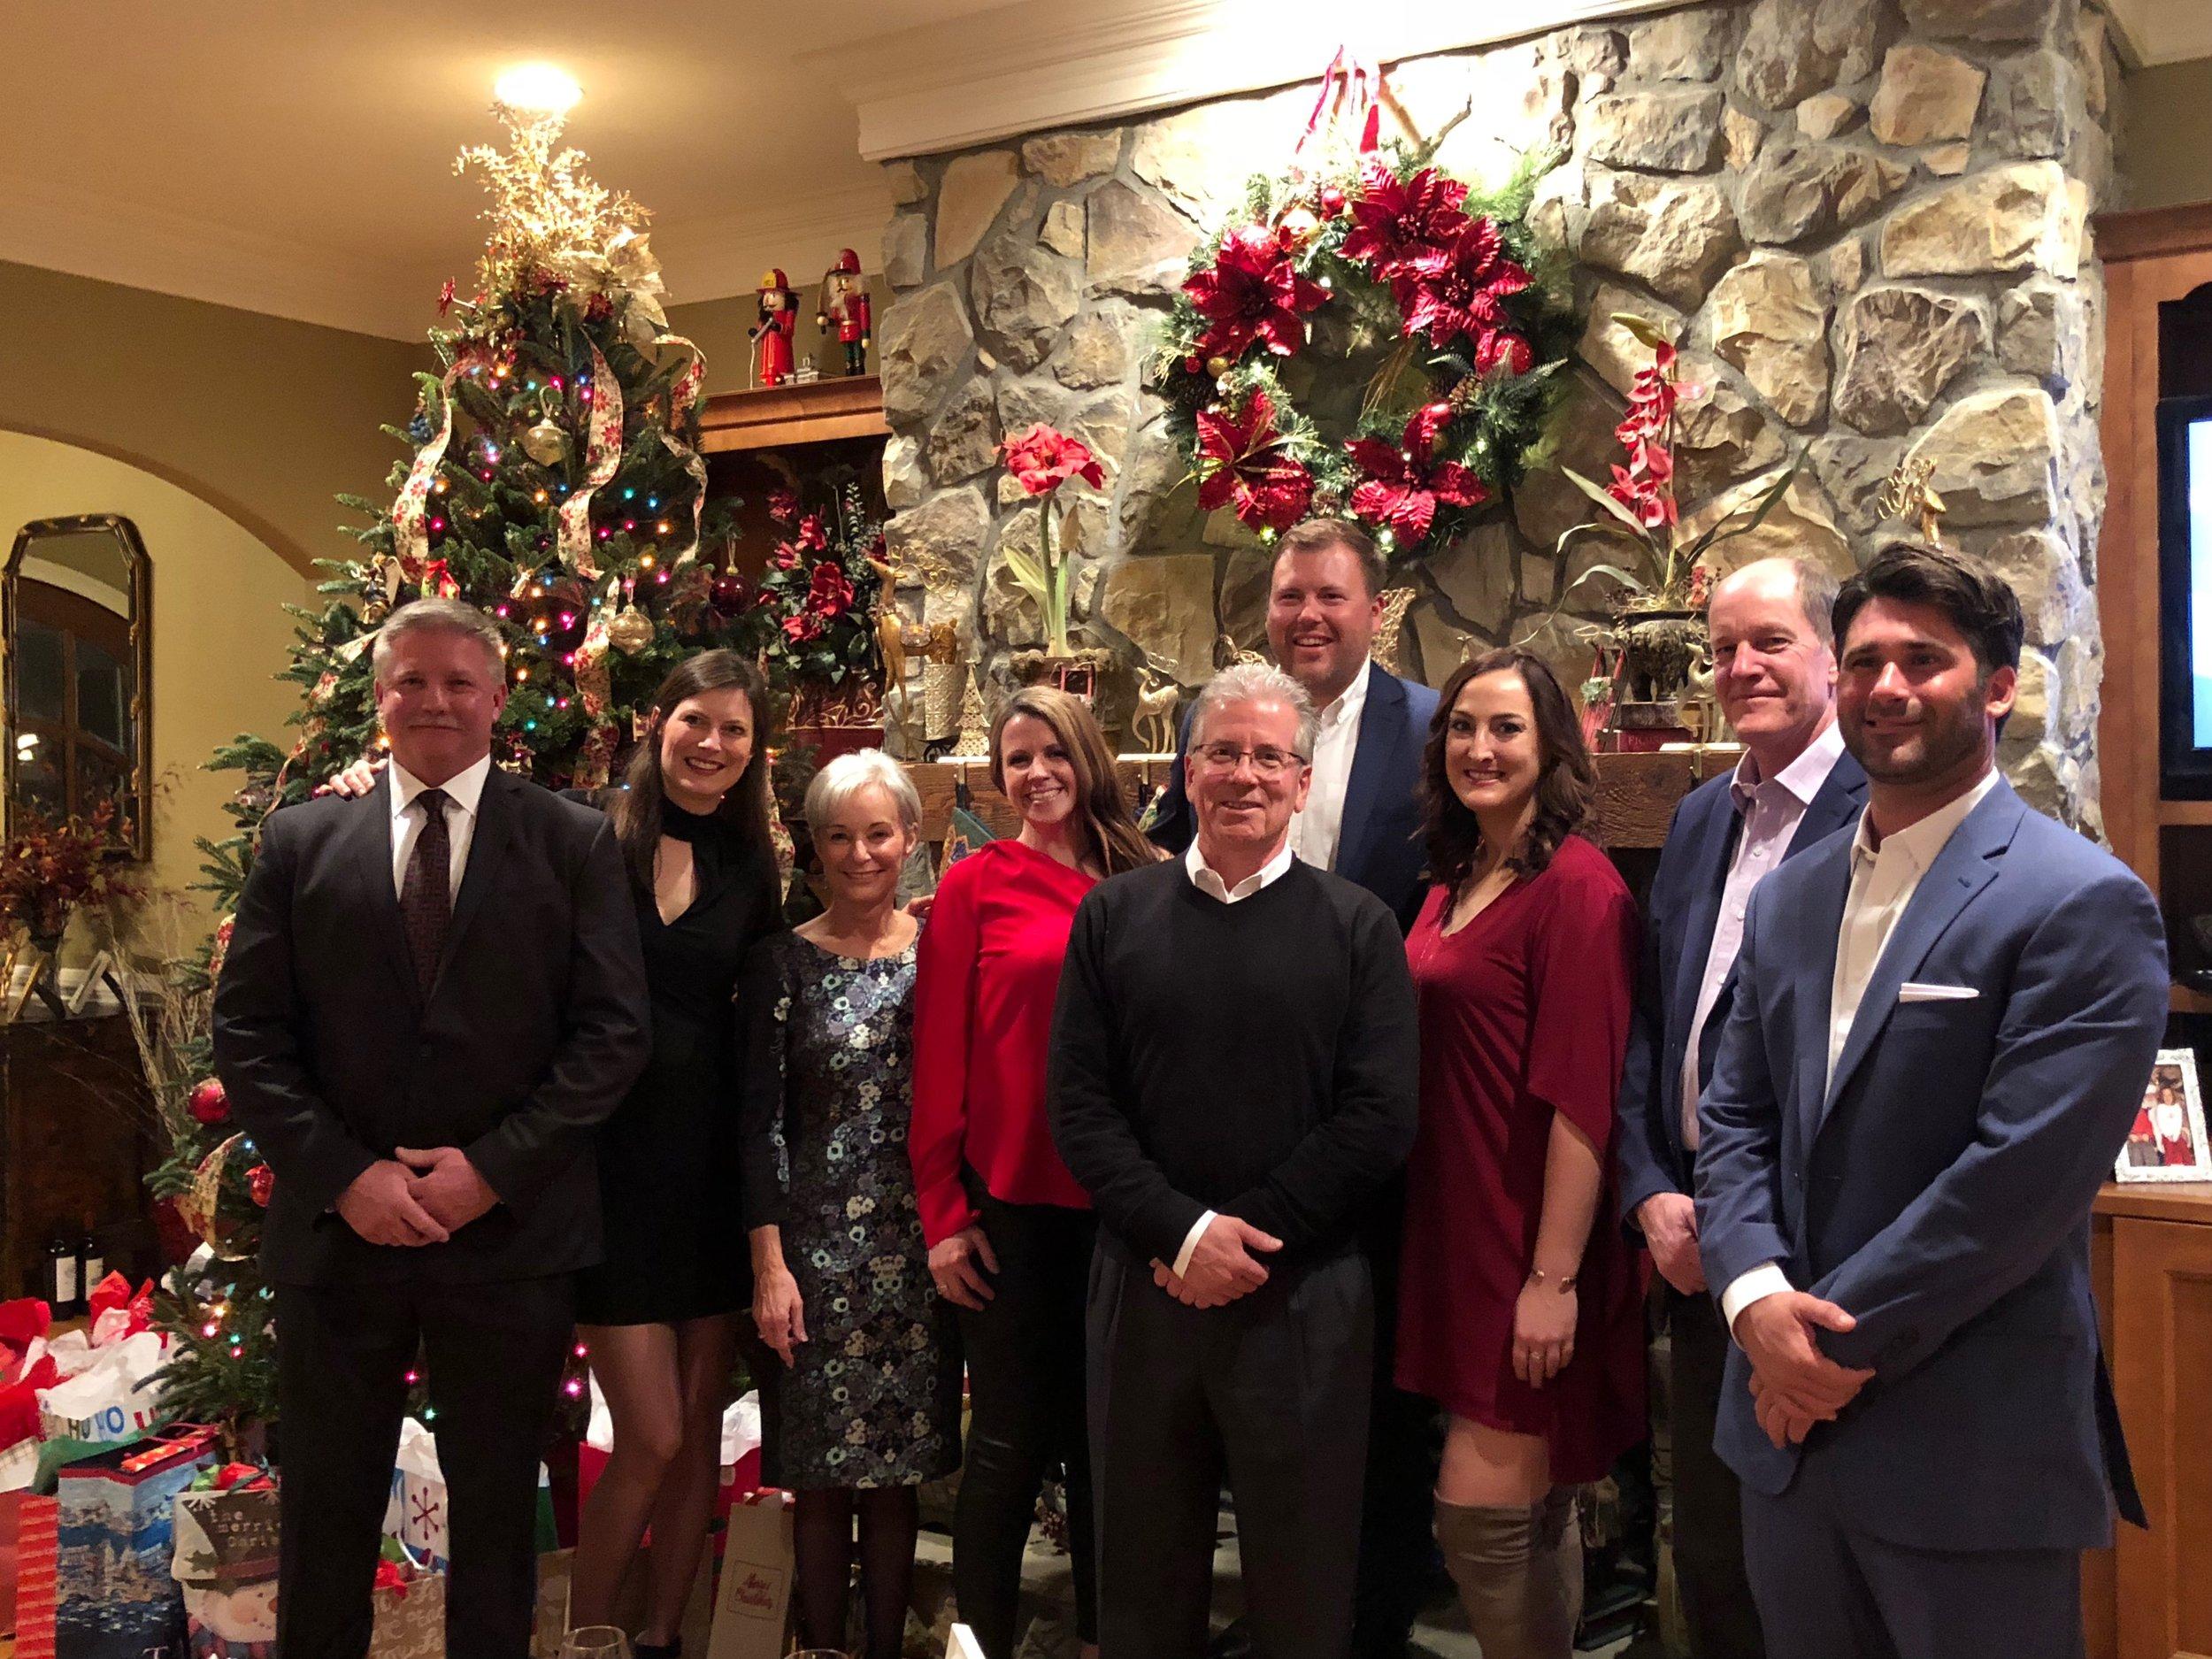 ECAM Family Holiday Photo 2017.JPG